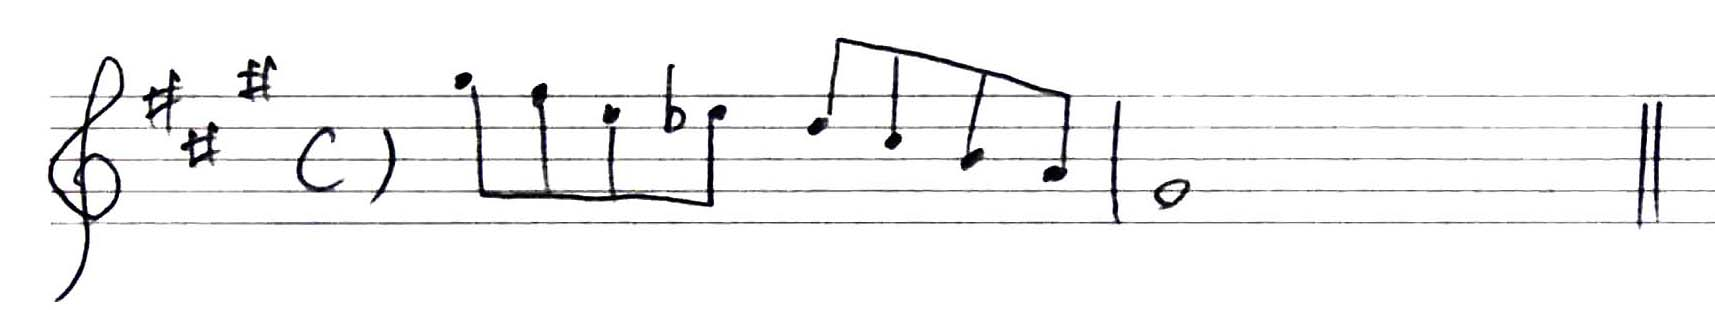 transposition-2-Bb